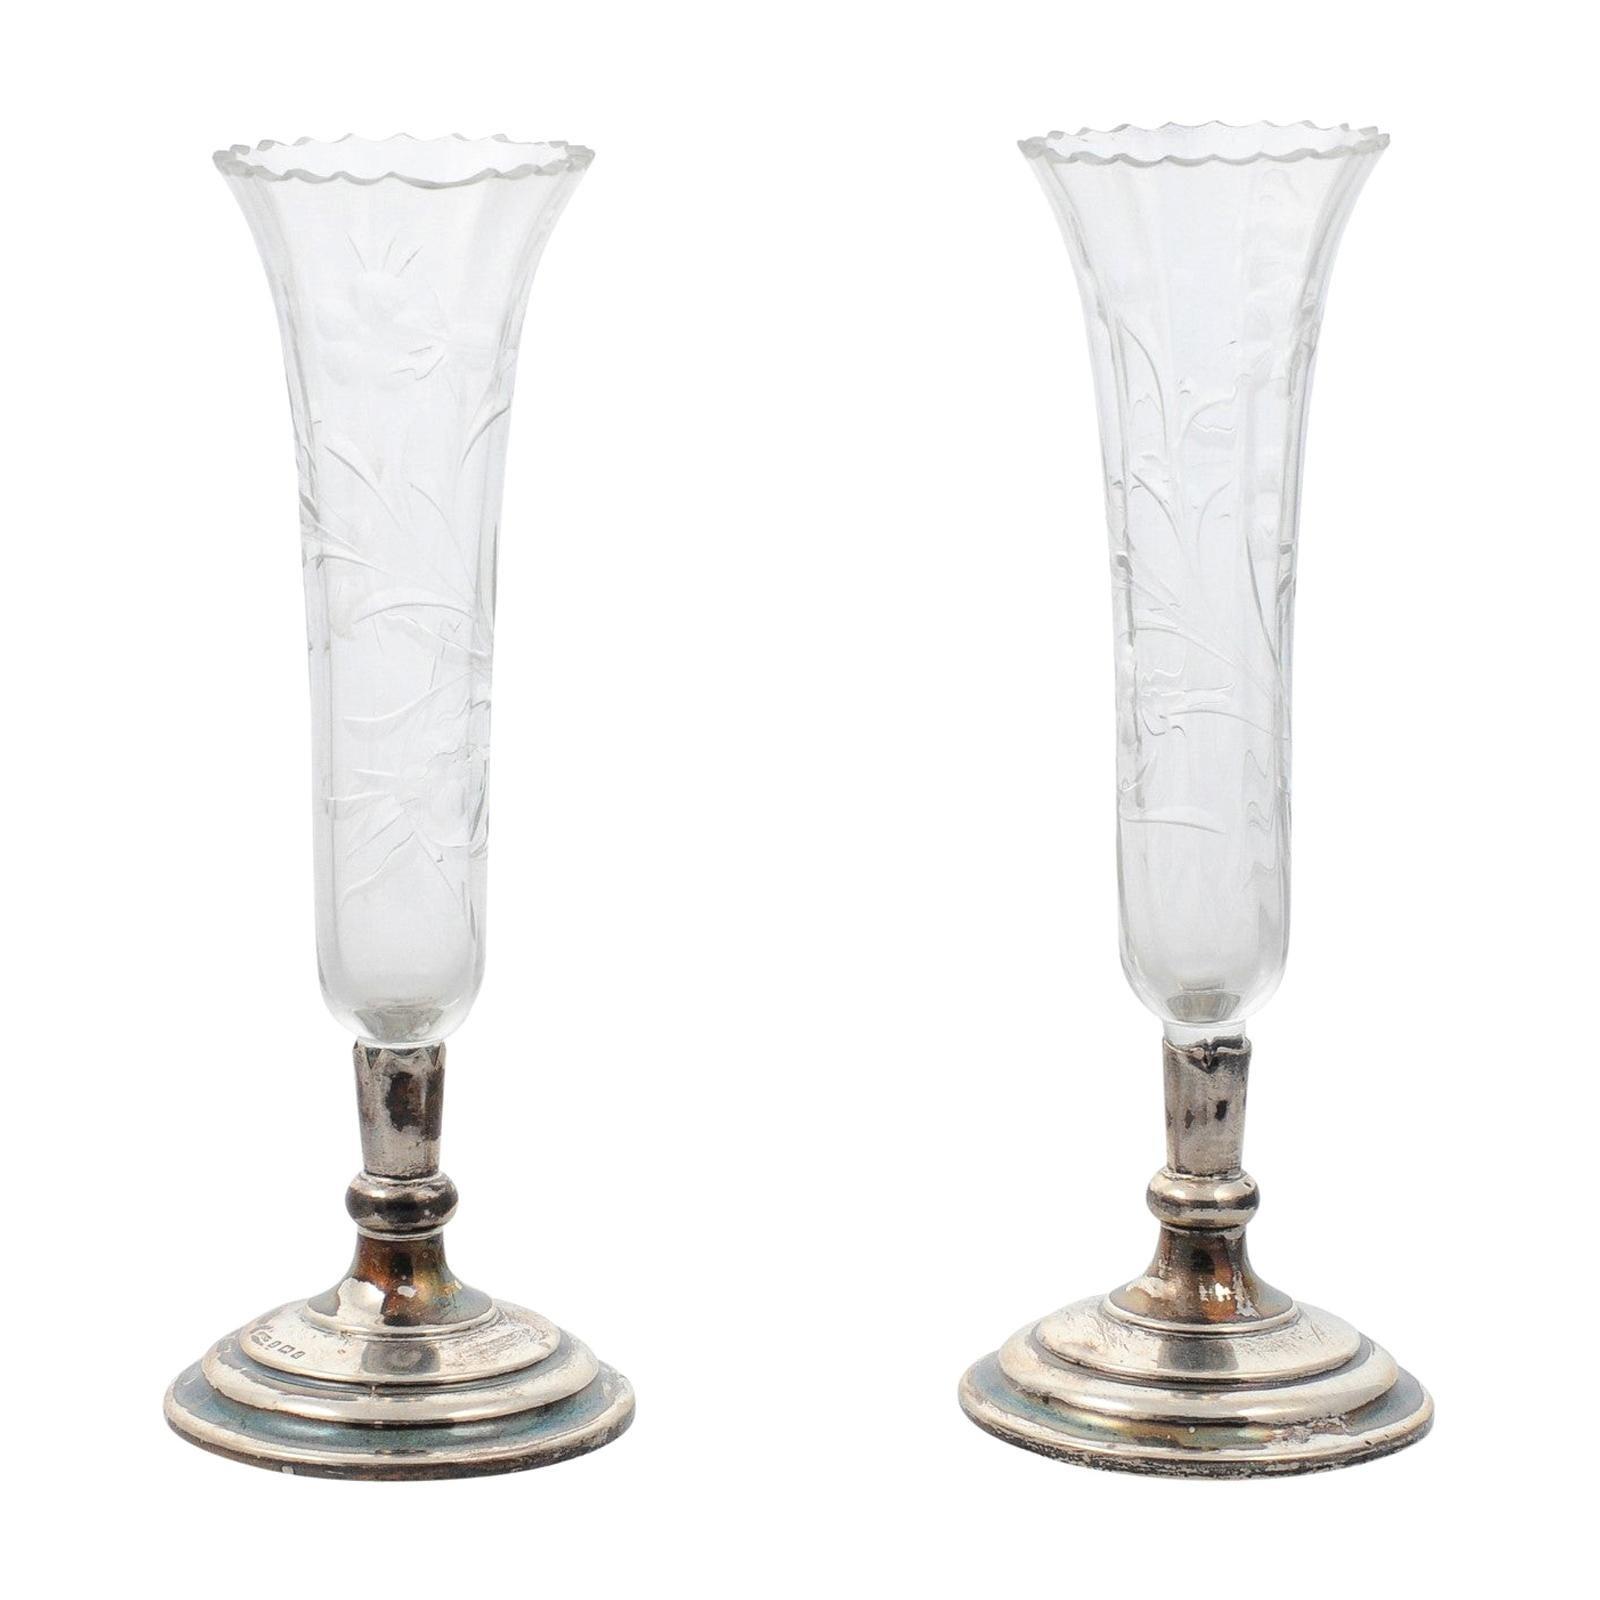 Restauration Vases and Vessels